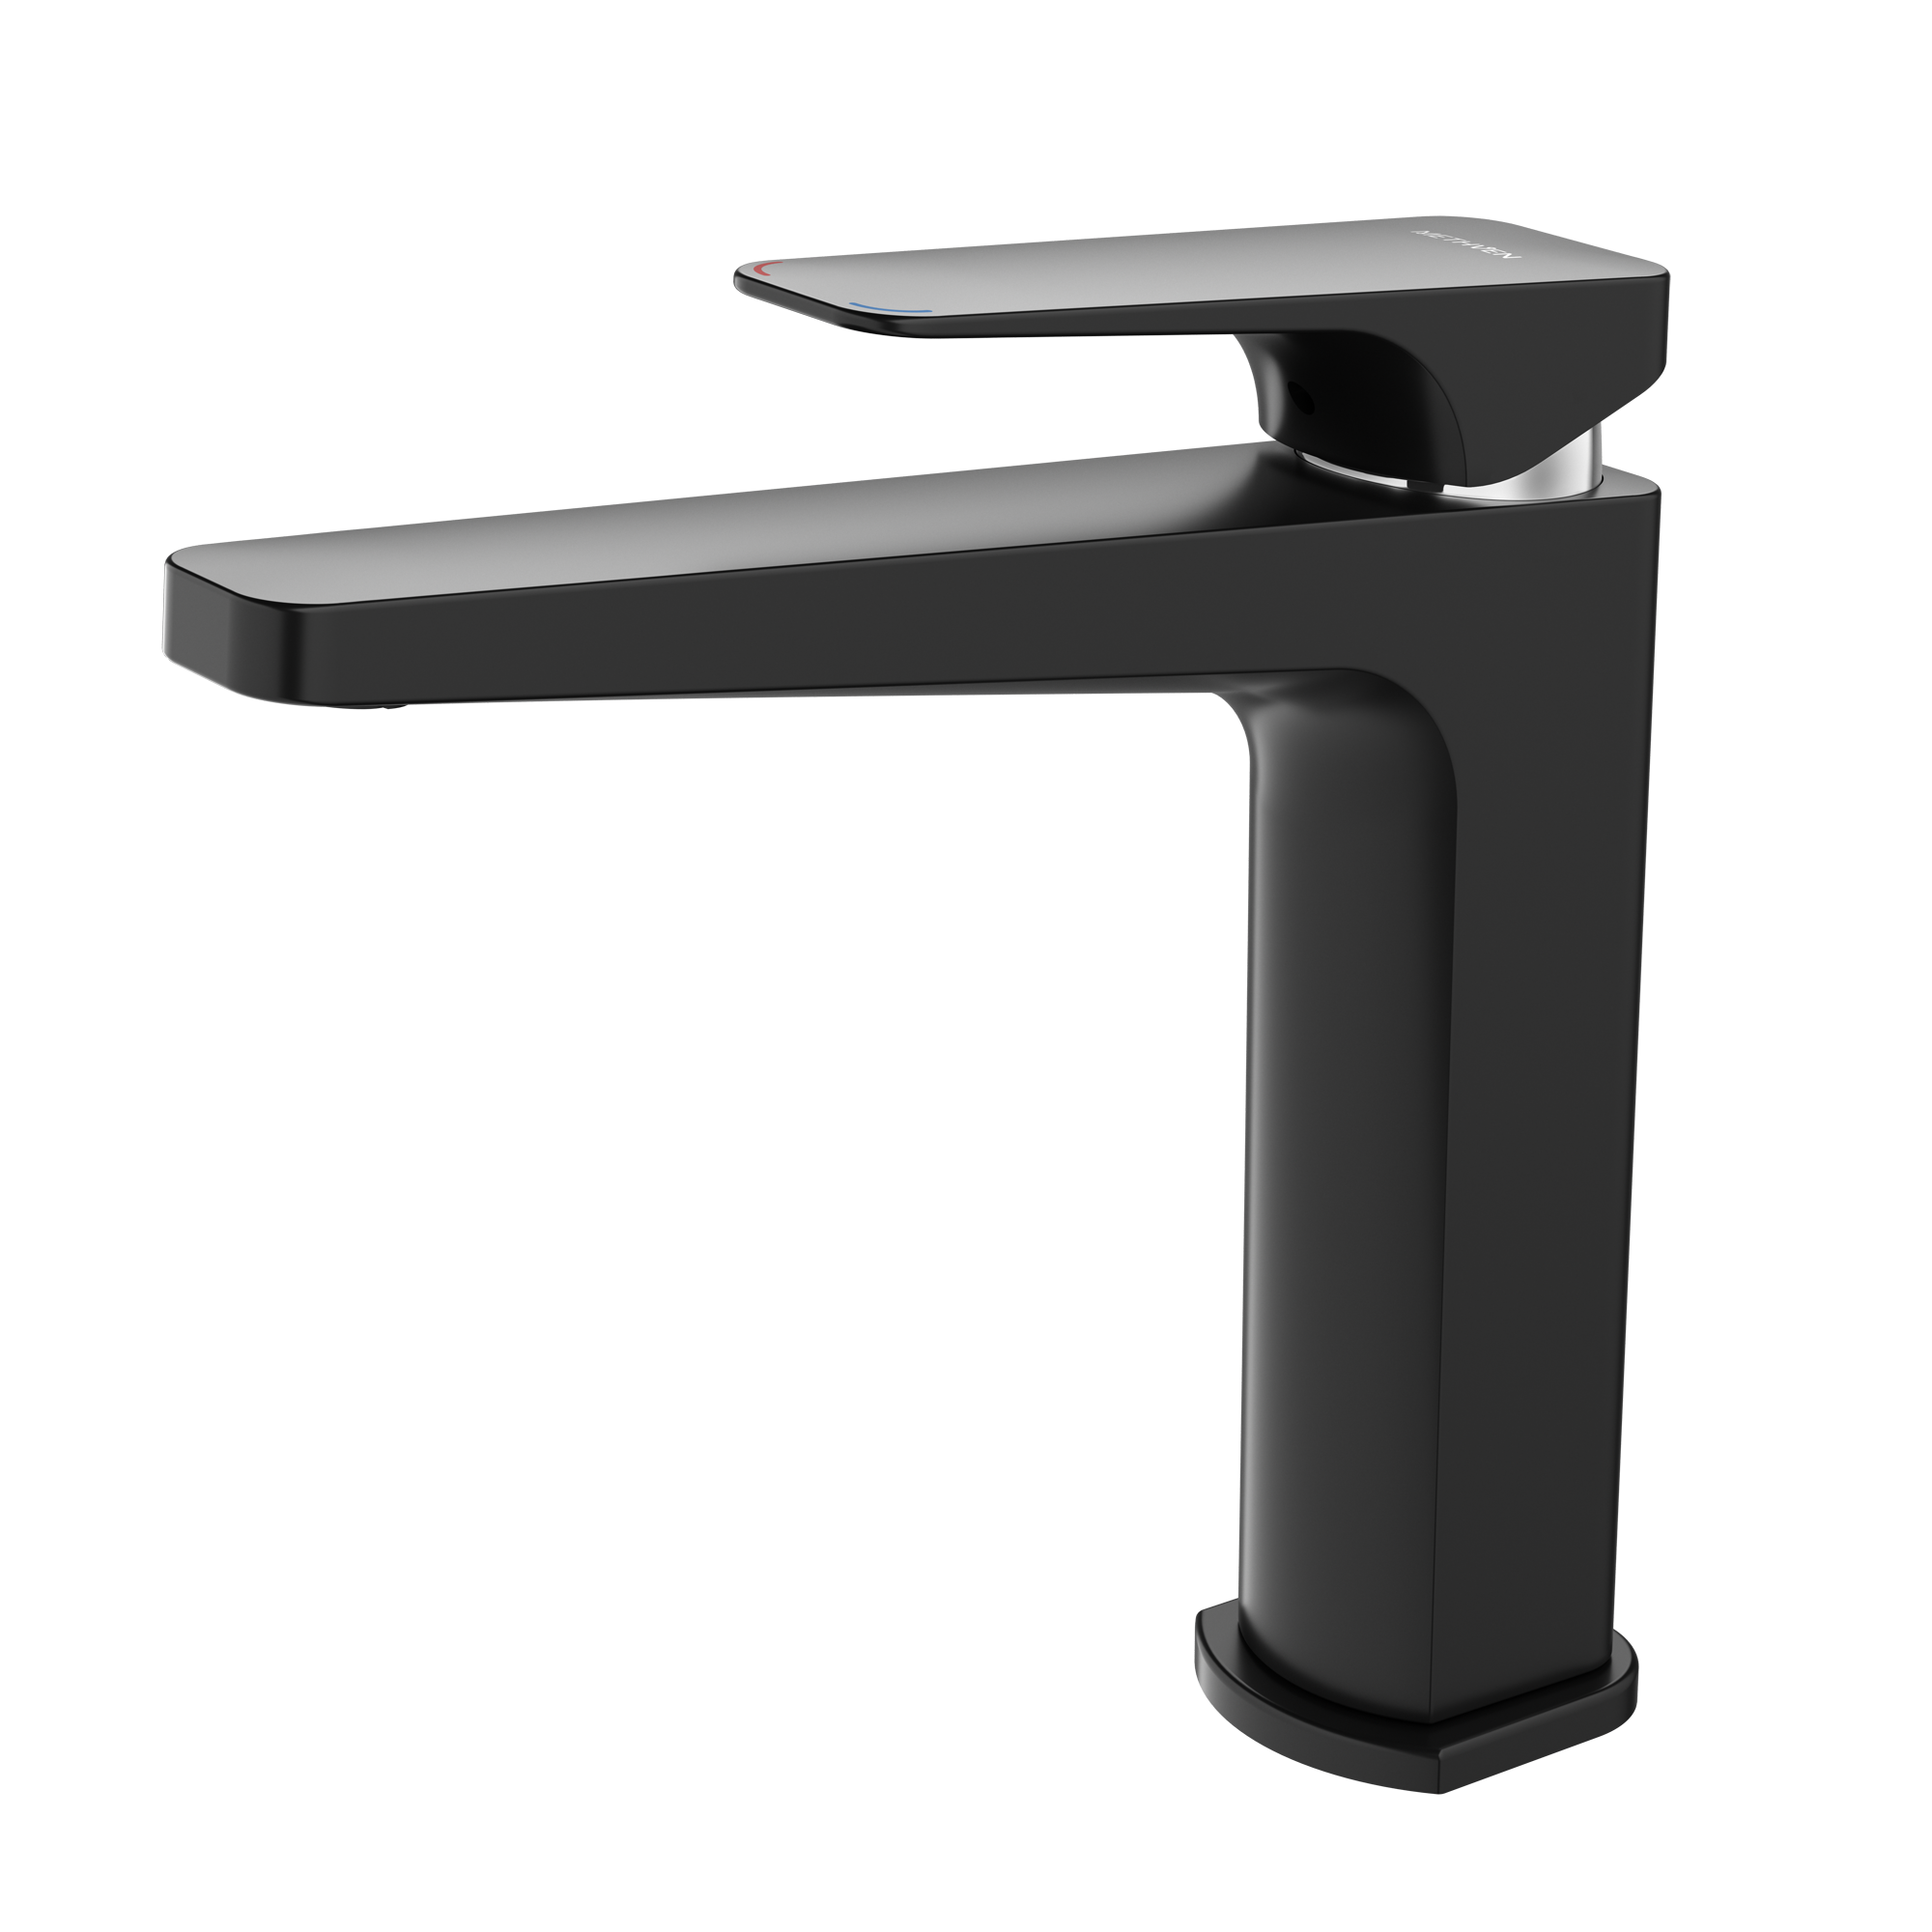 Waipori Sink Mixer Black kitchen taps, Kitchen taps, Sink